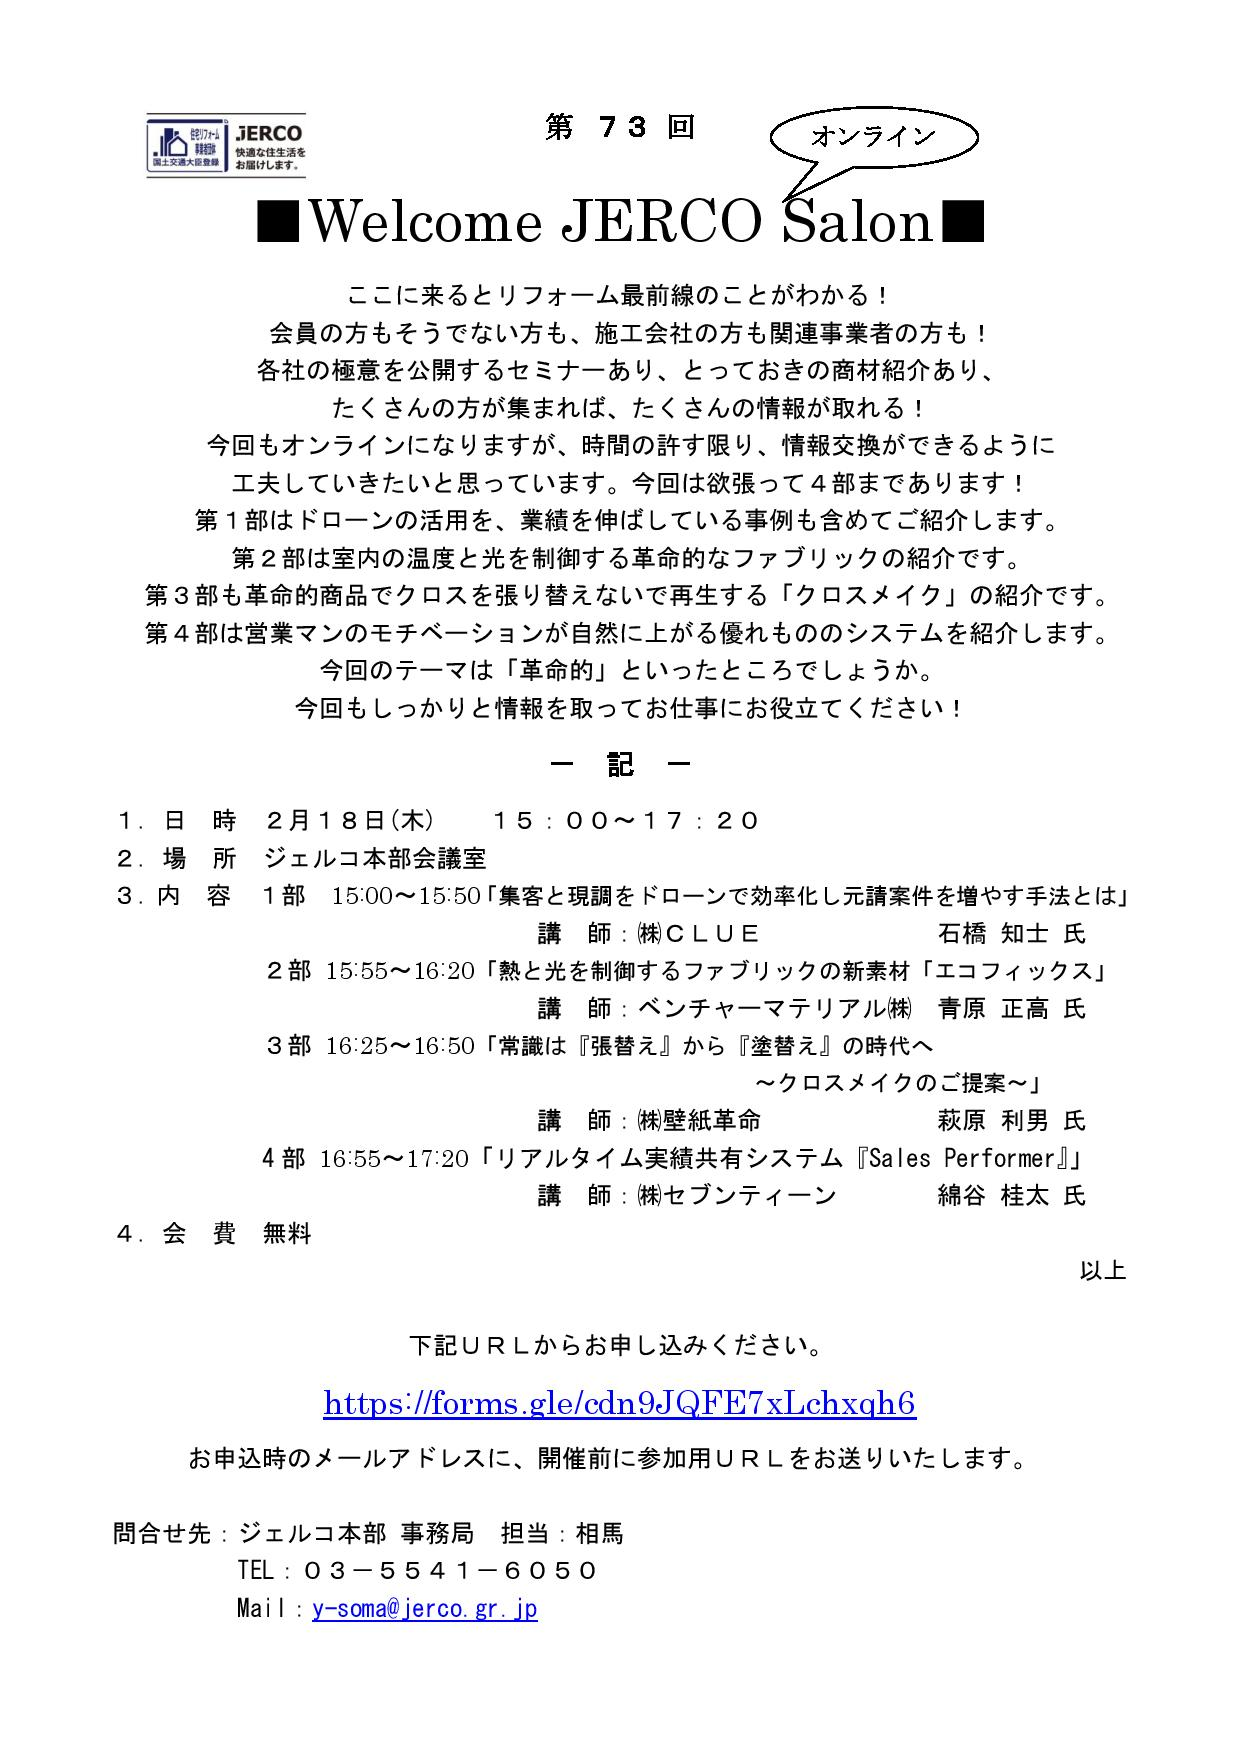 2021年2月18日(木)15:00~ Welcome JERCO Salon